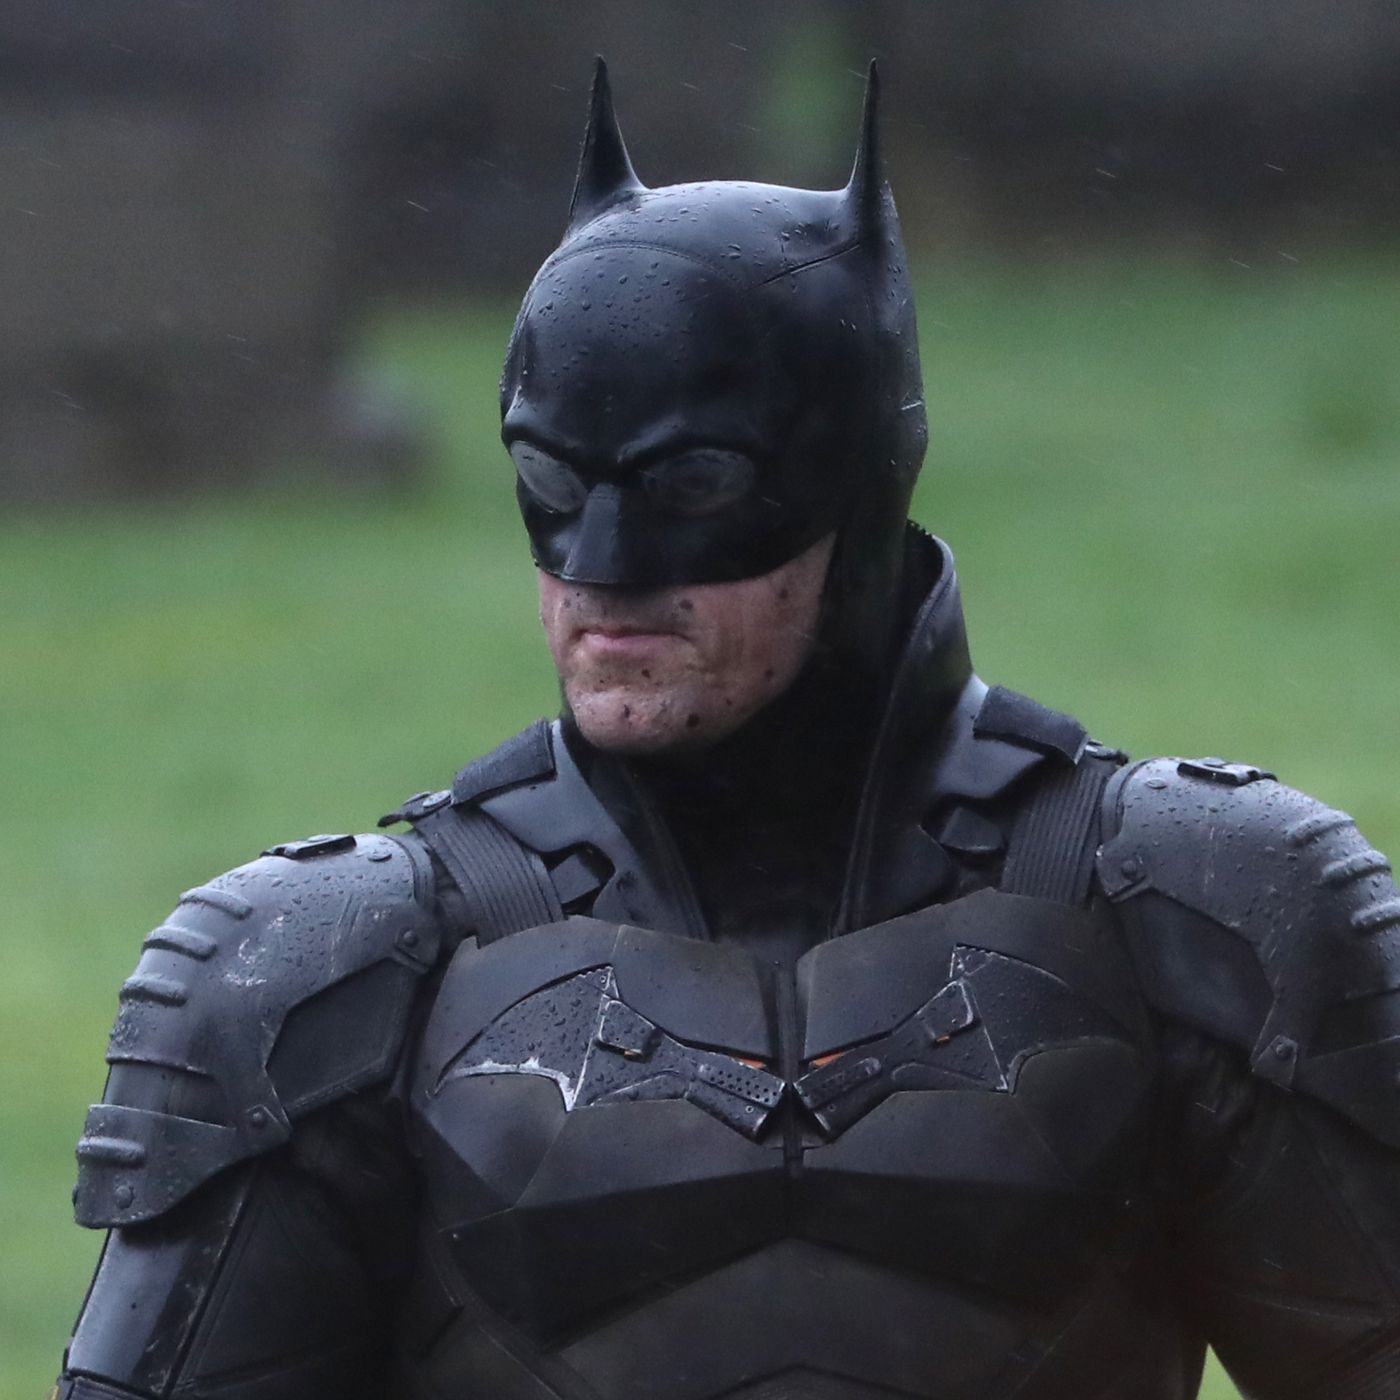 The Batman set photos reveal Pattinson's full costume and Bat-bike ...